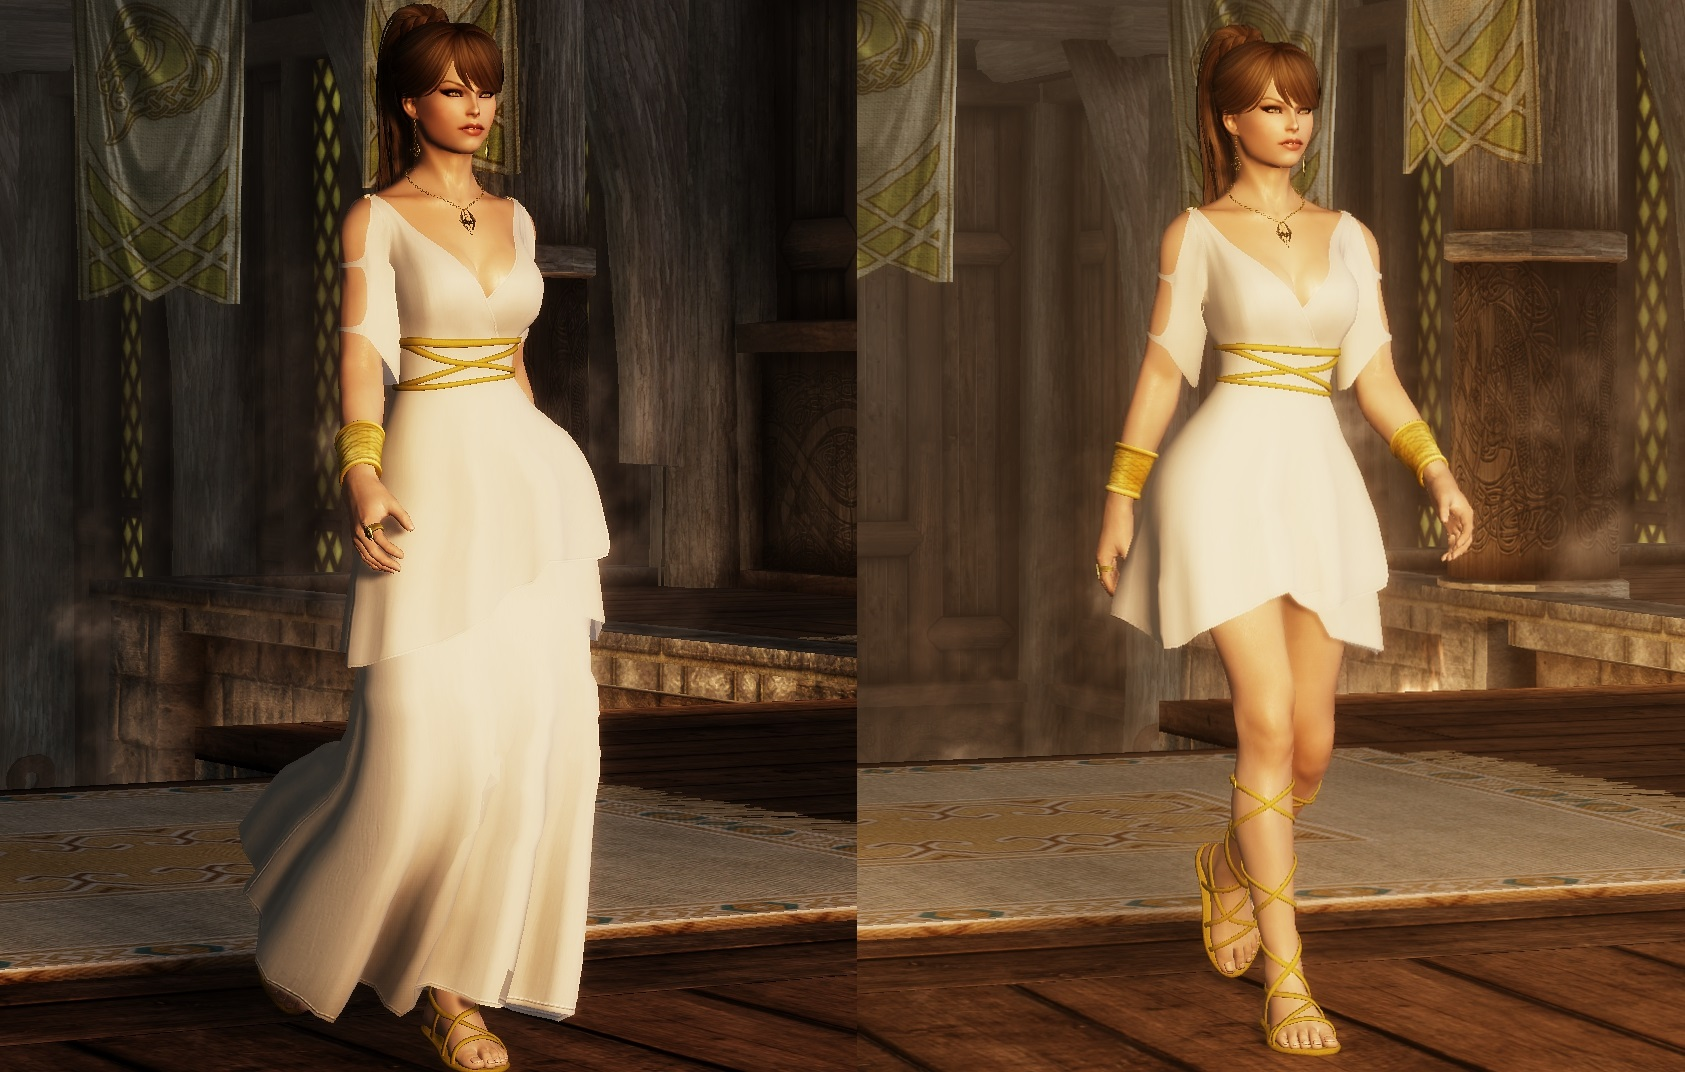 Skyrim Wedding Dress.Steam Workshop Ashara Imperial Outfit